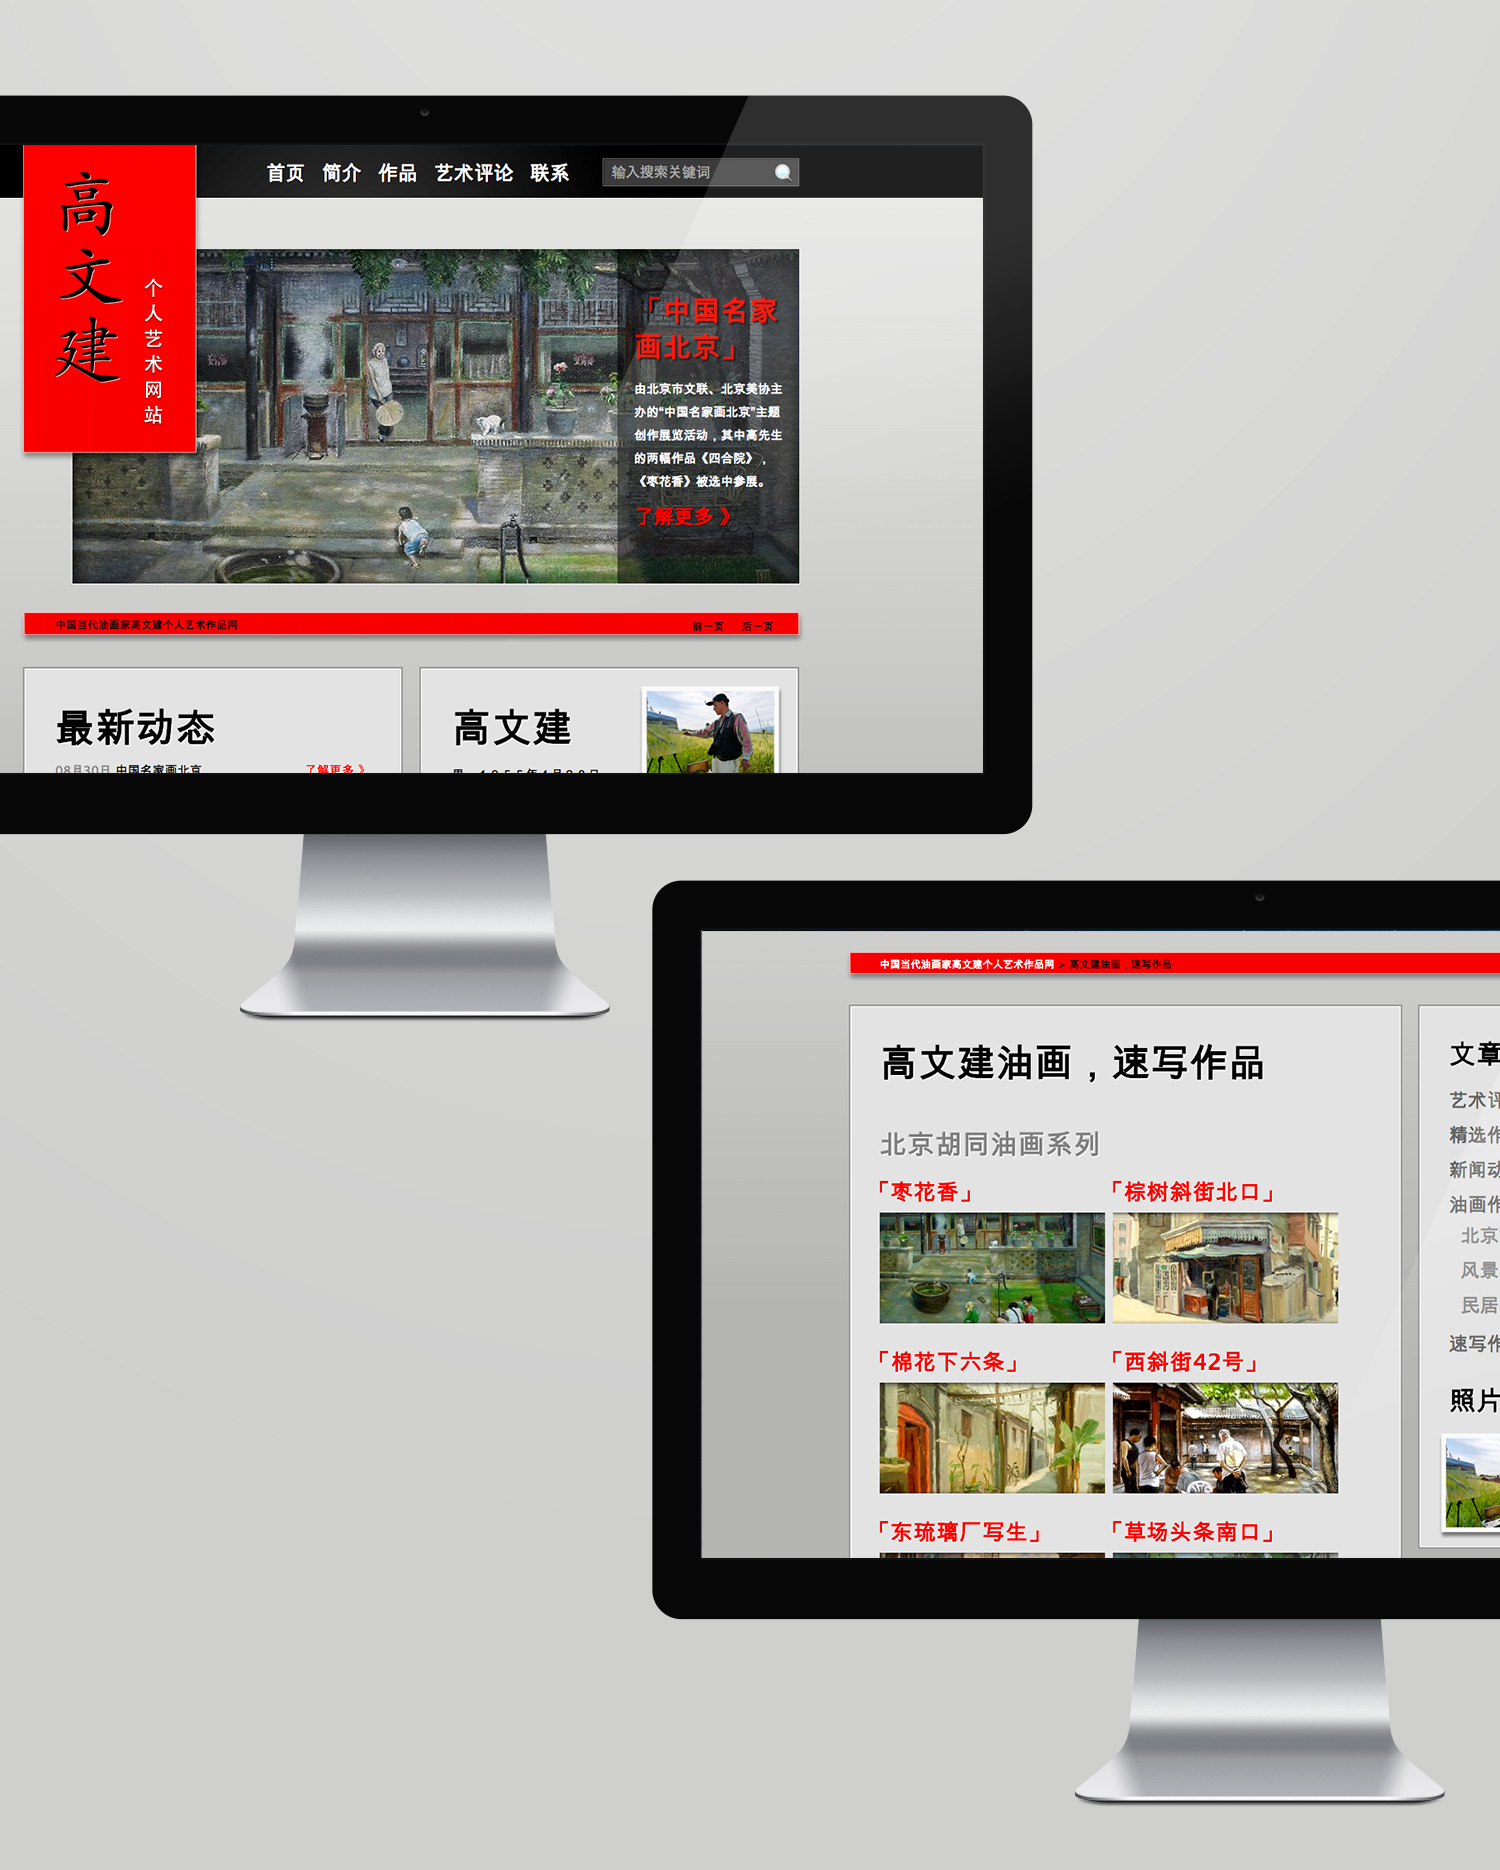 Gao Wenjian Portfolio SIte - Geng Gao Web Design